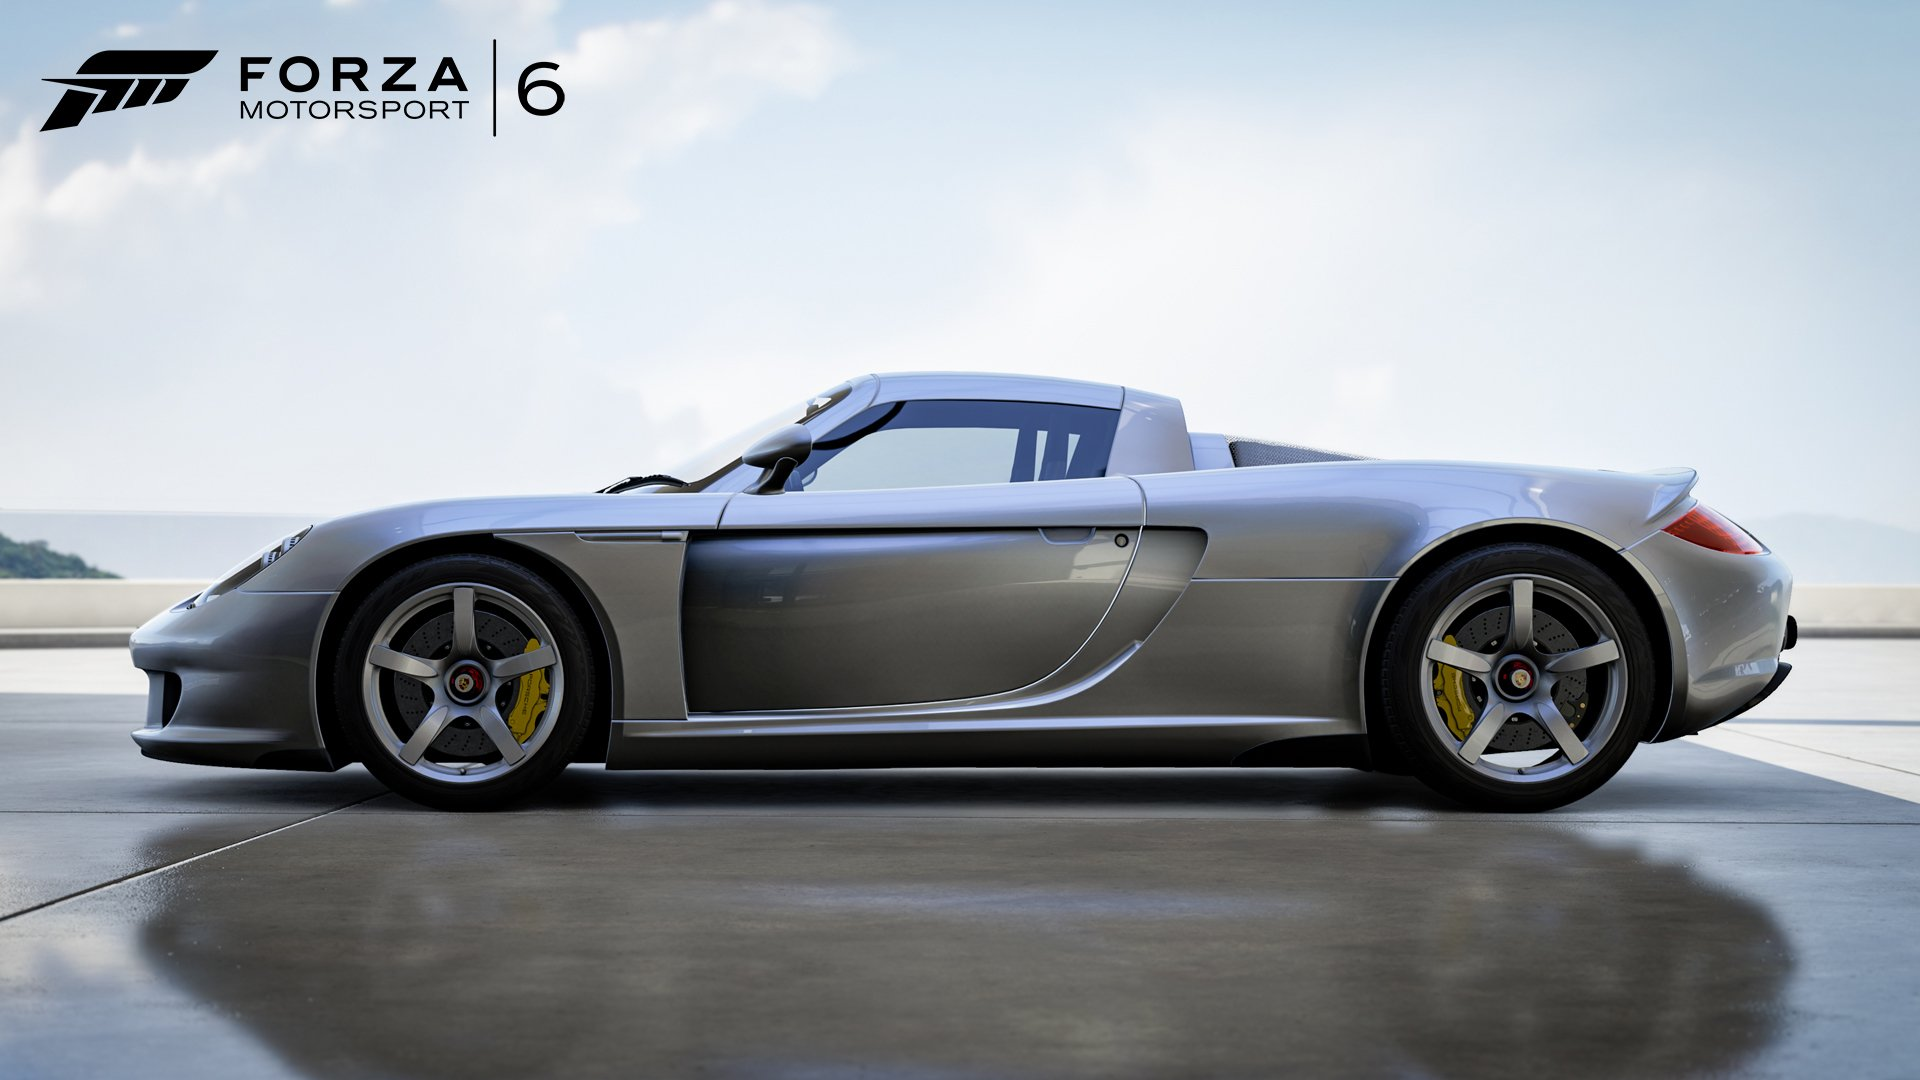 2003 Porsche Carrera Gt Papel De Parede Hd Plano De Fundo 1920x1080 Id 683840 Wallpaper Abyss